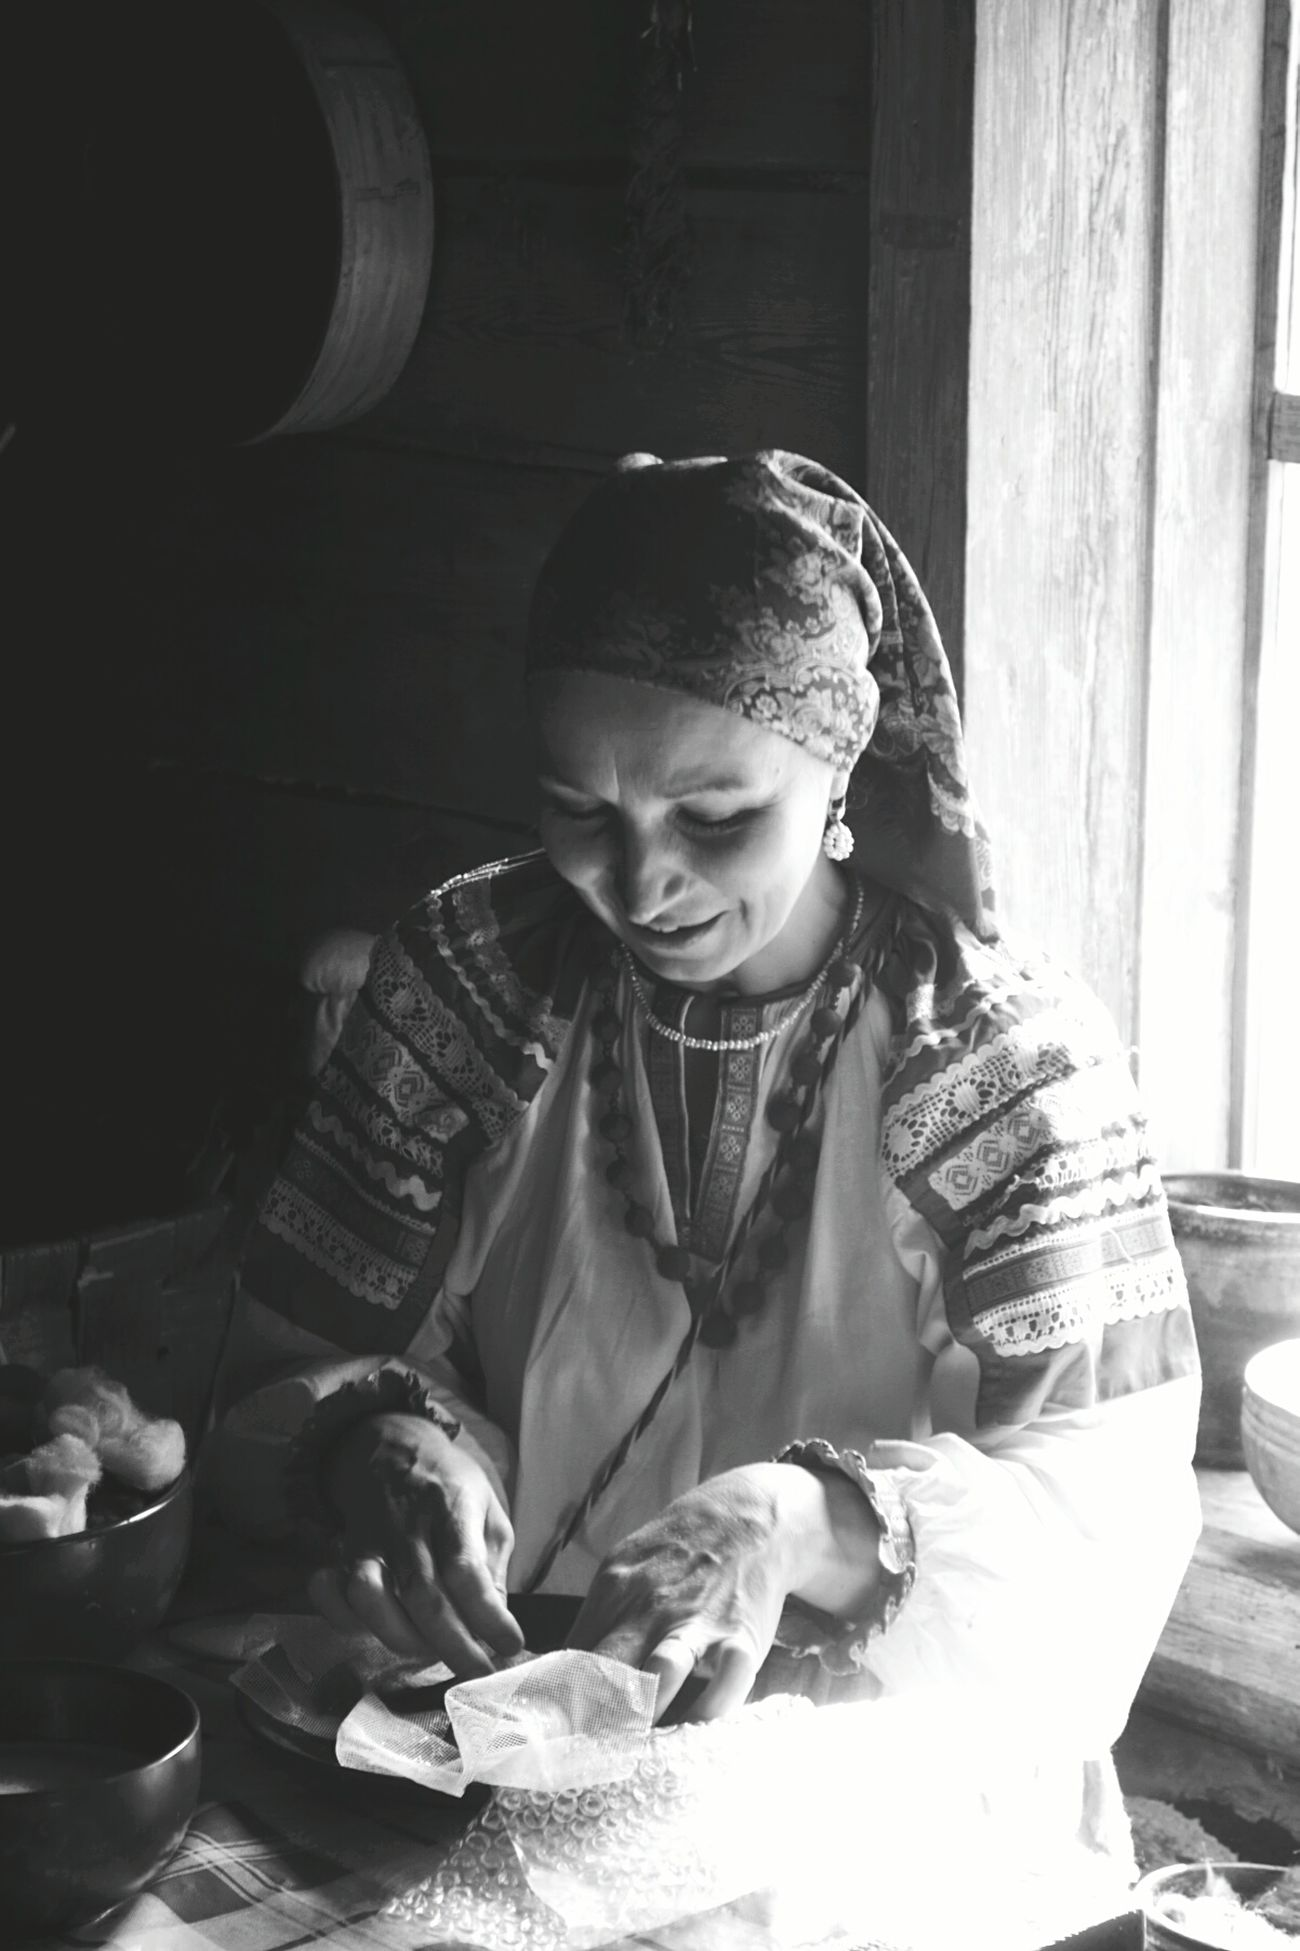 Summer Novgorod Woman handmade